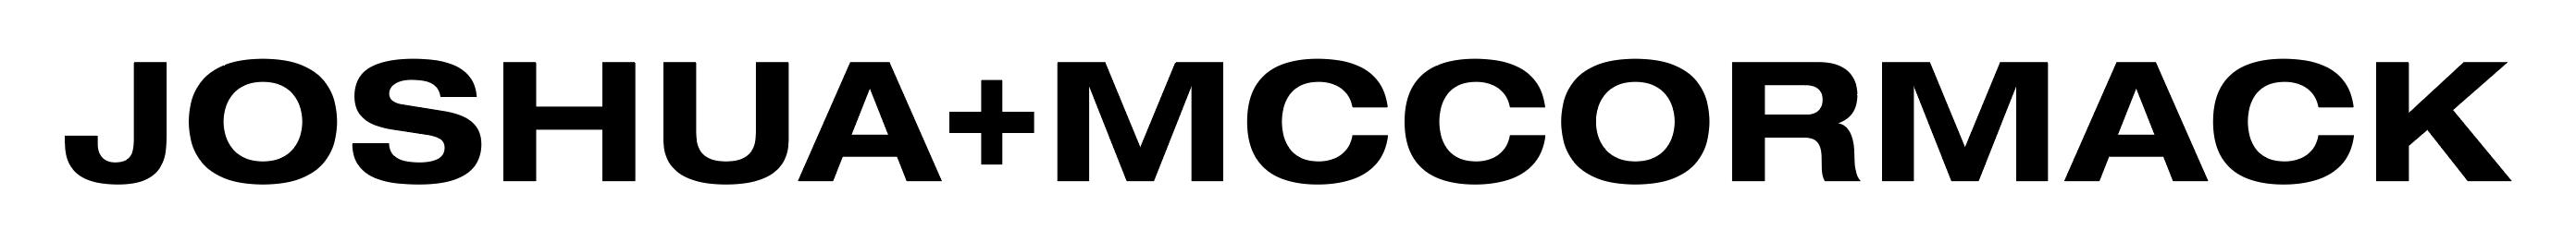 Joshua McCormack - Photography Motion